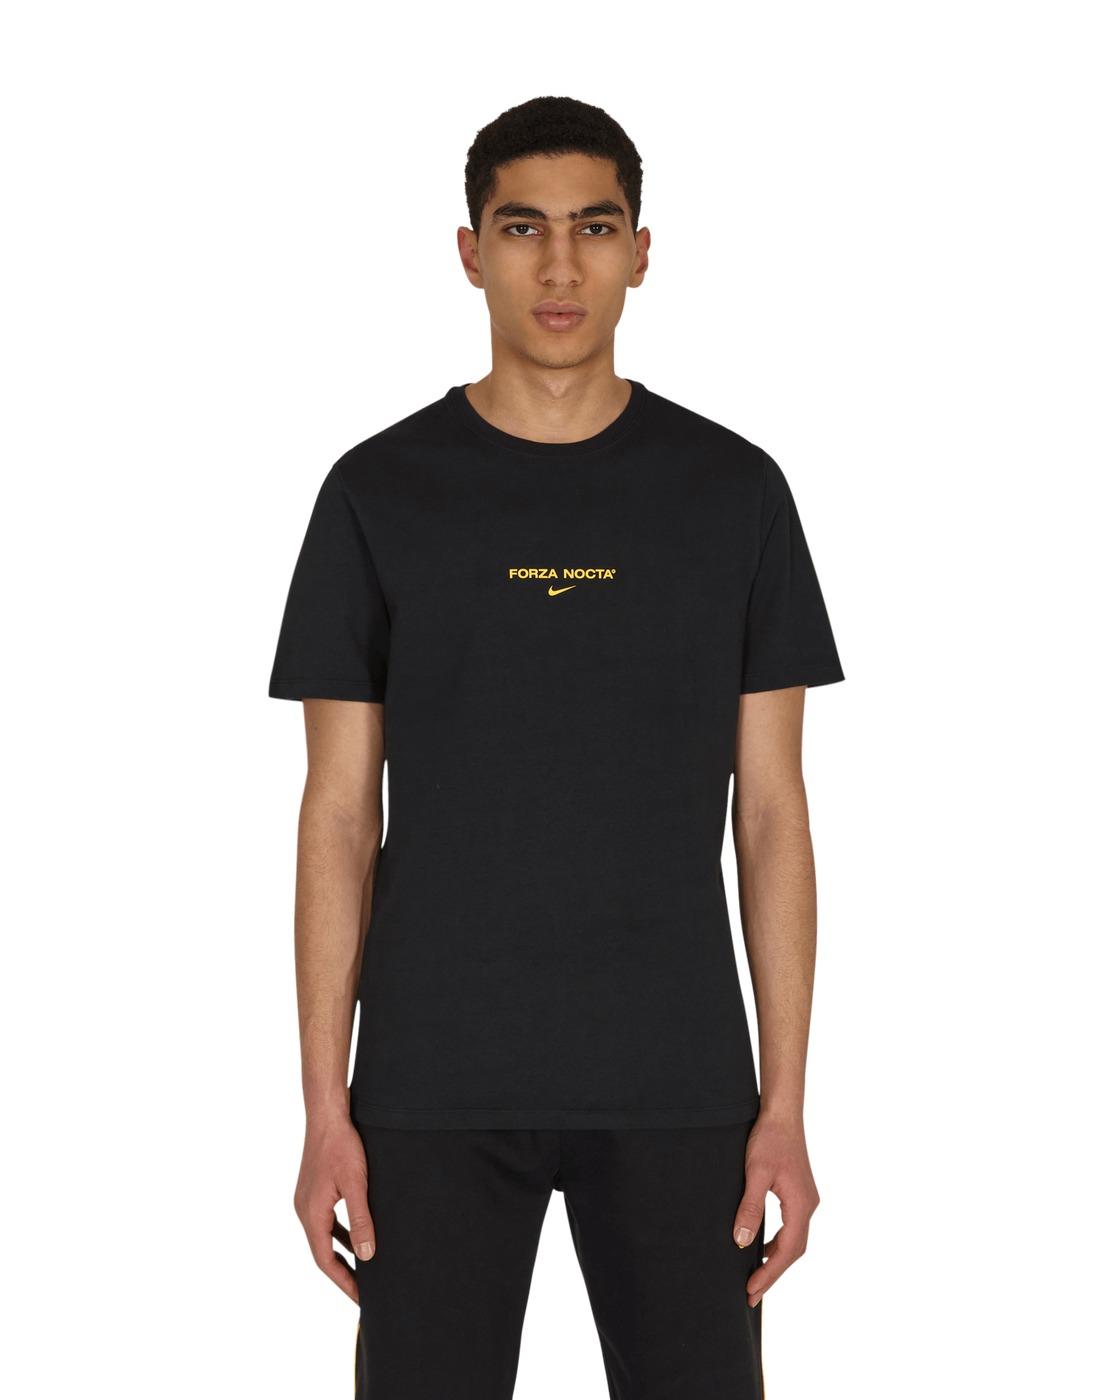 Nike Special Project Nocta Essential T Shirt Black/University Gold